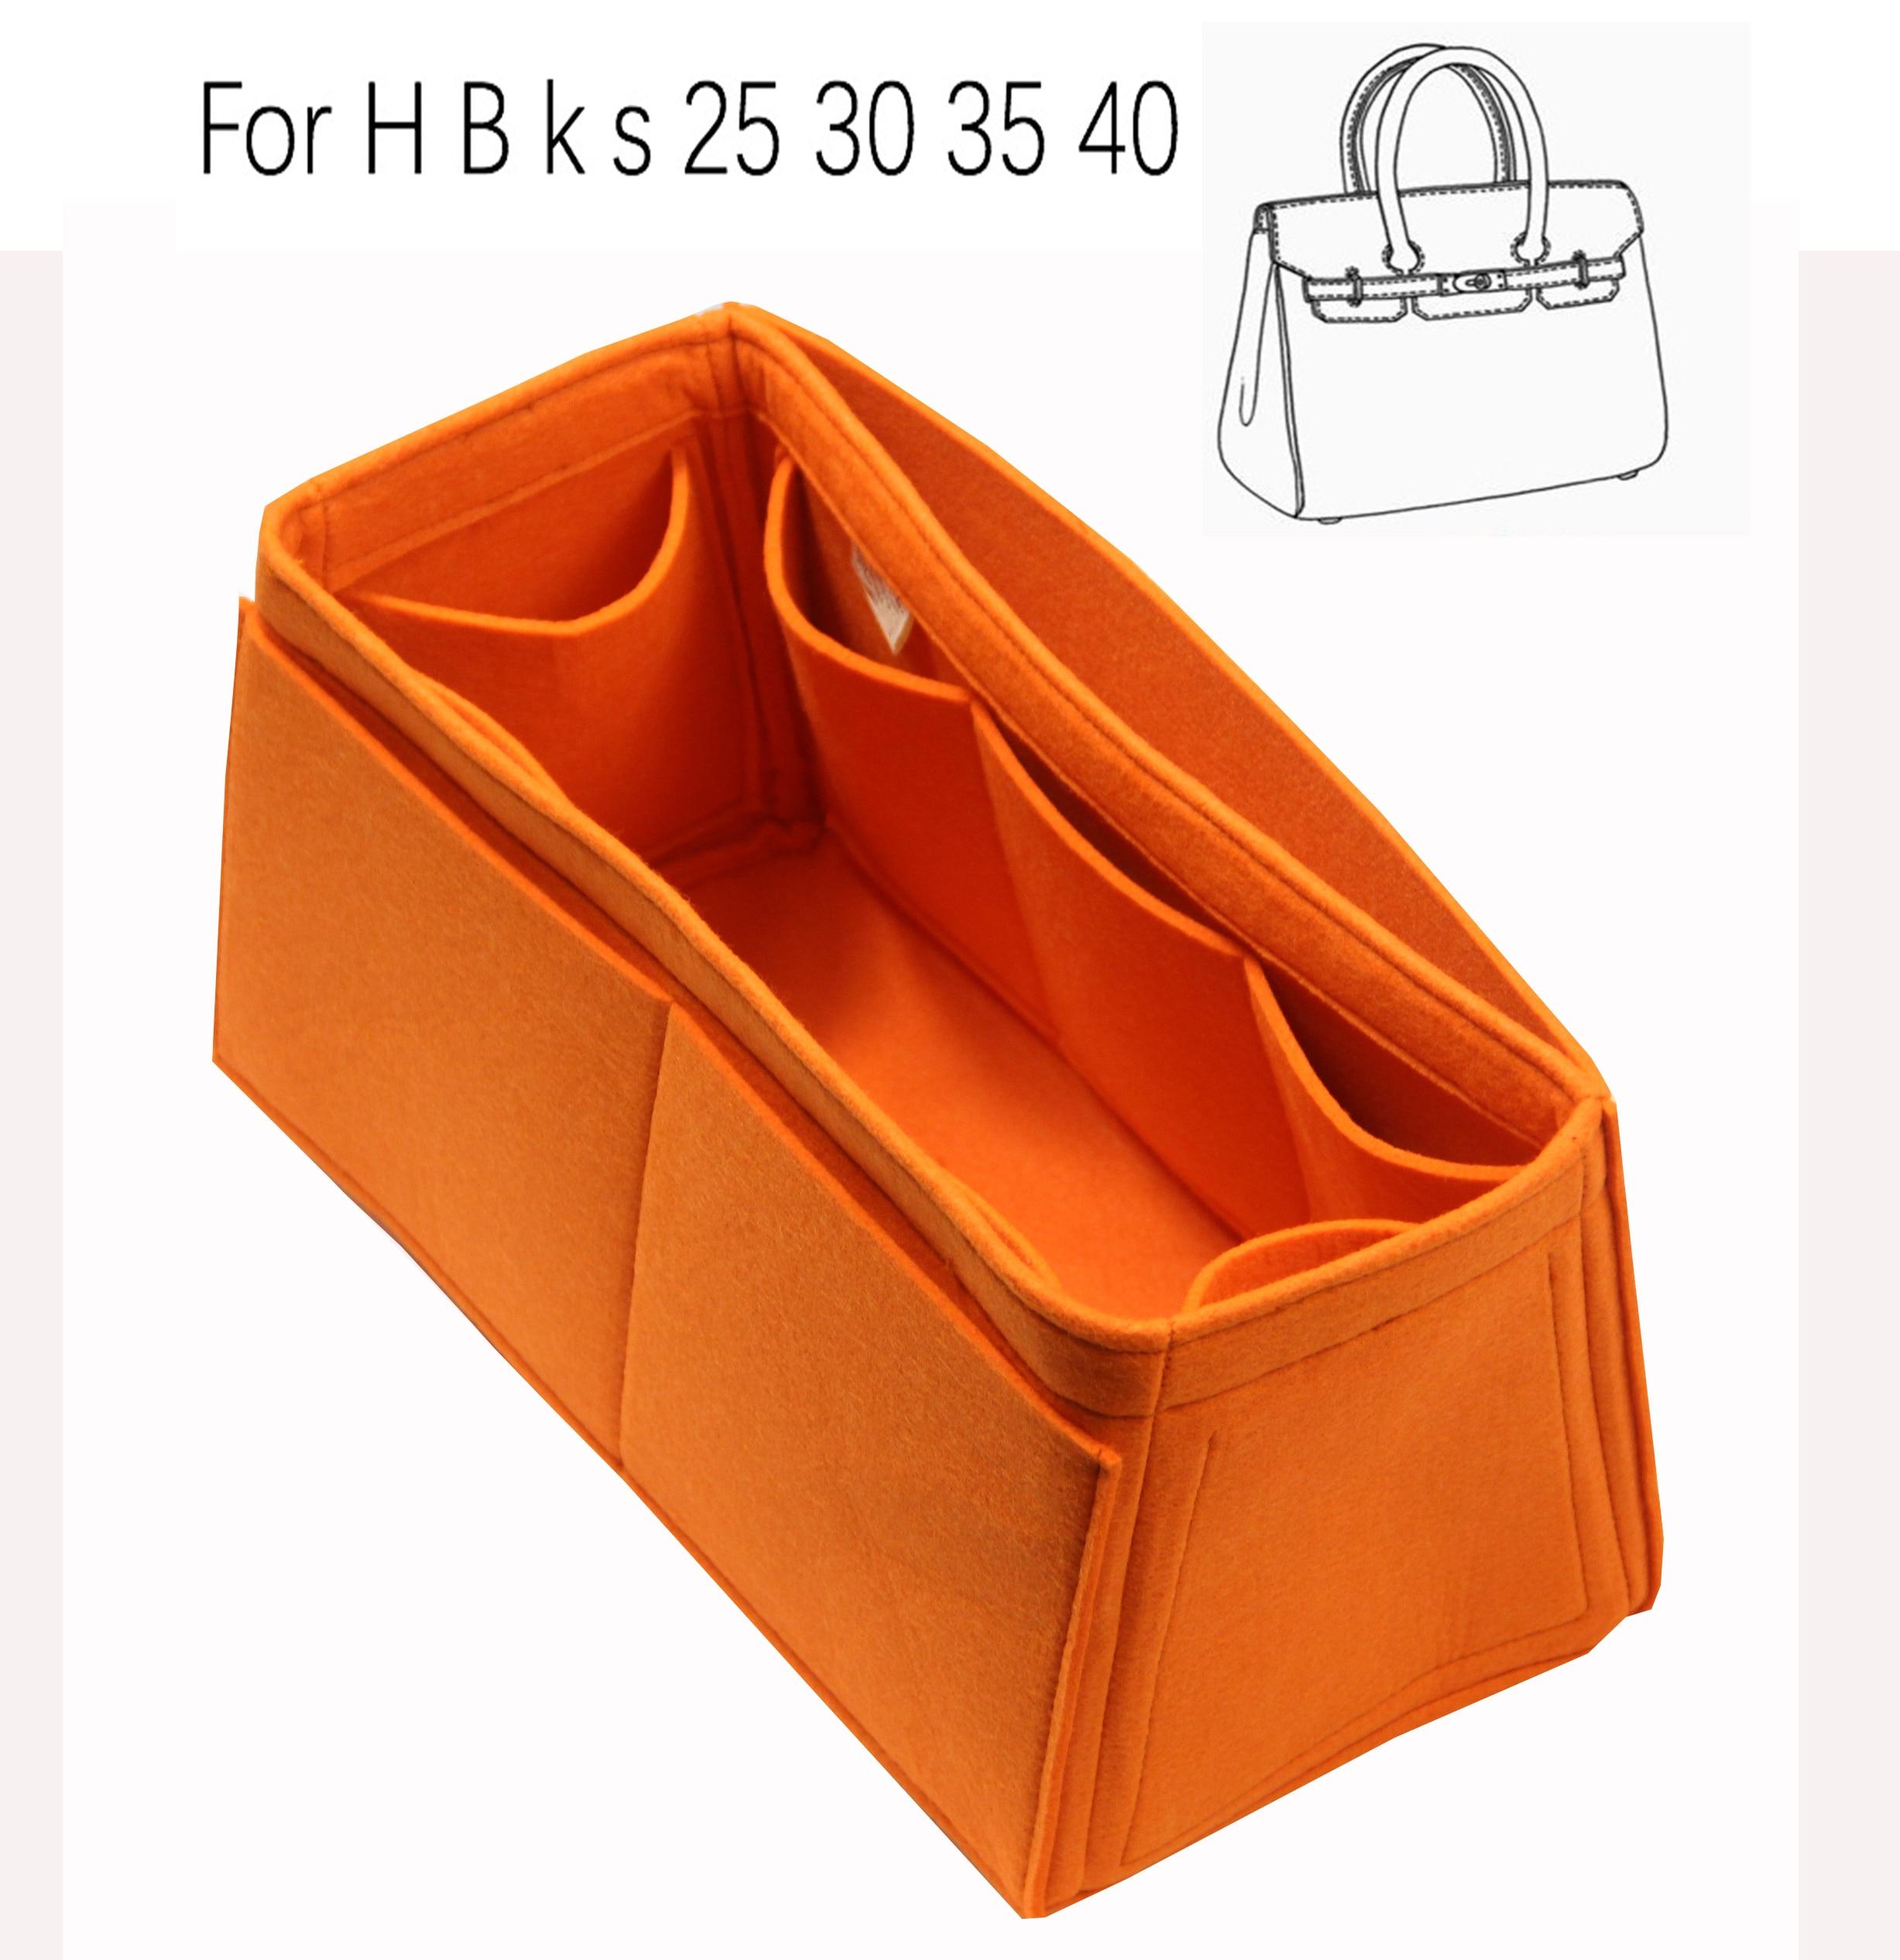 For H 25 Bir 30 k s 35 40 handmade 3MM Felt Insert Bags Organizer Makeup Handbag Organize Portable Cosmetic base shape